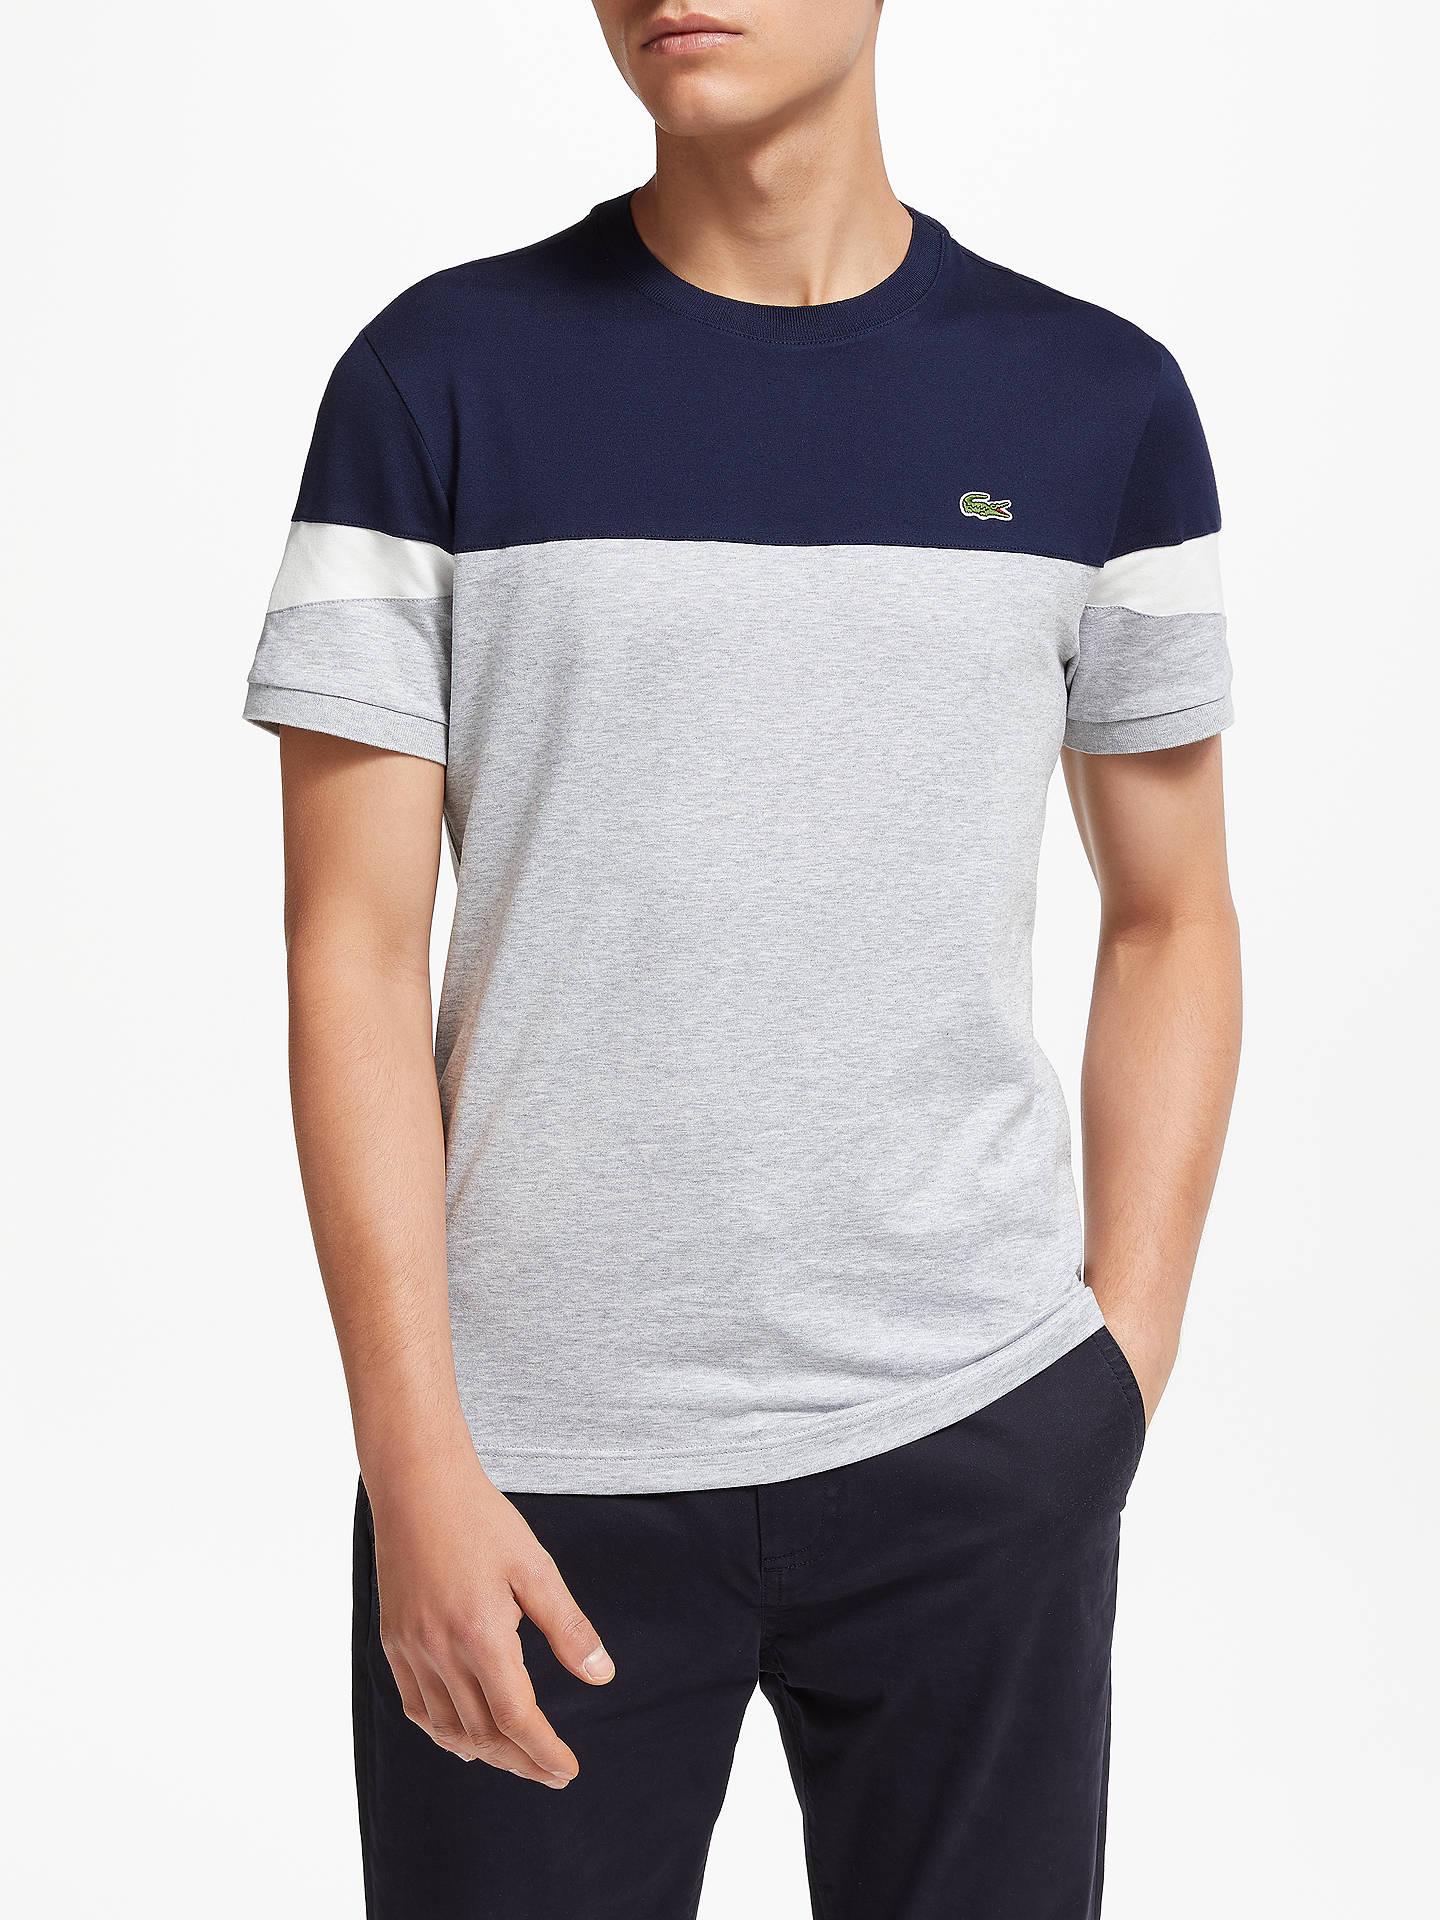 399324217 Lacoste Short Sleeve Colour Block T-Shirt, Grey/Navy/White at John ...